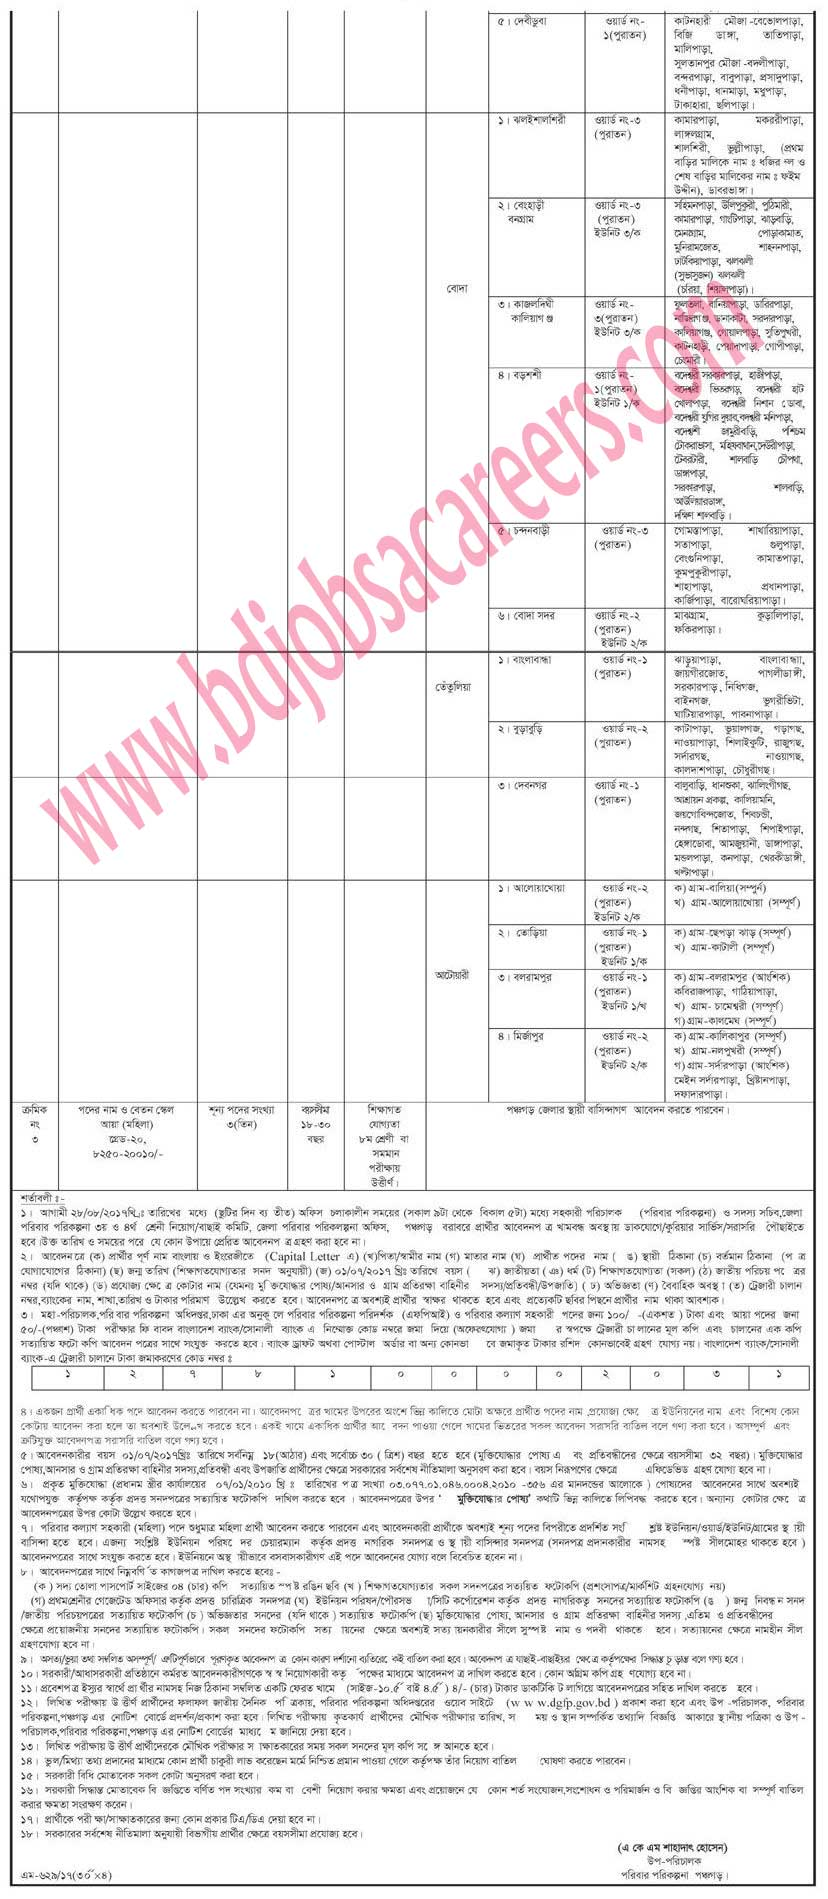 Panchagarh District Family Planning Office Job Circular 2017